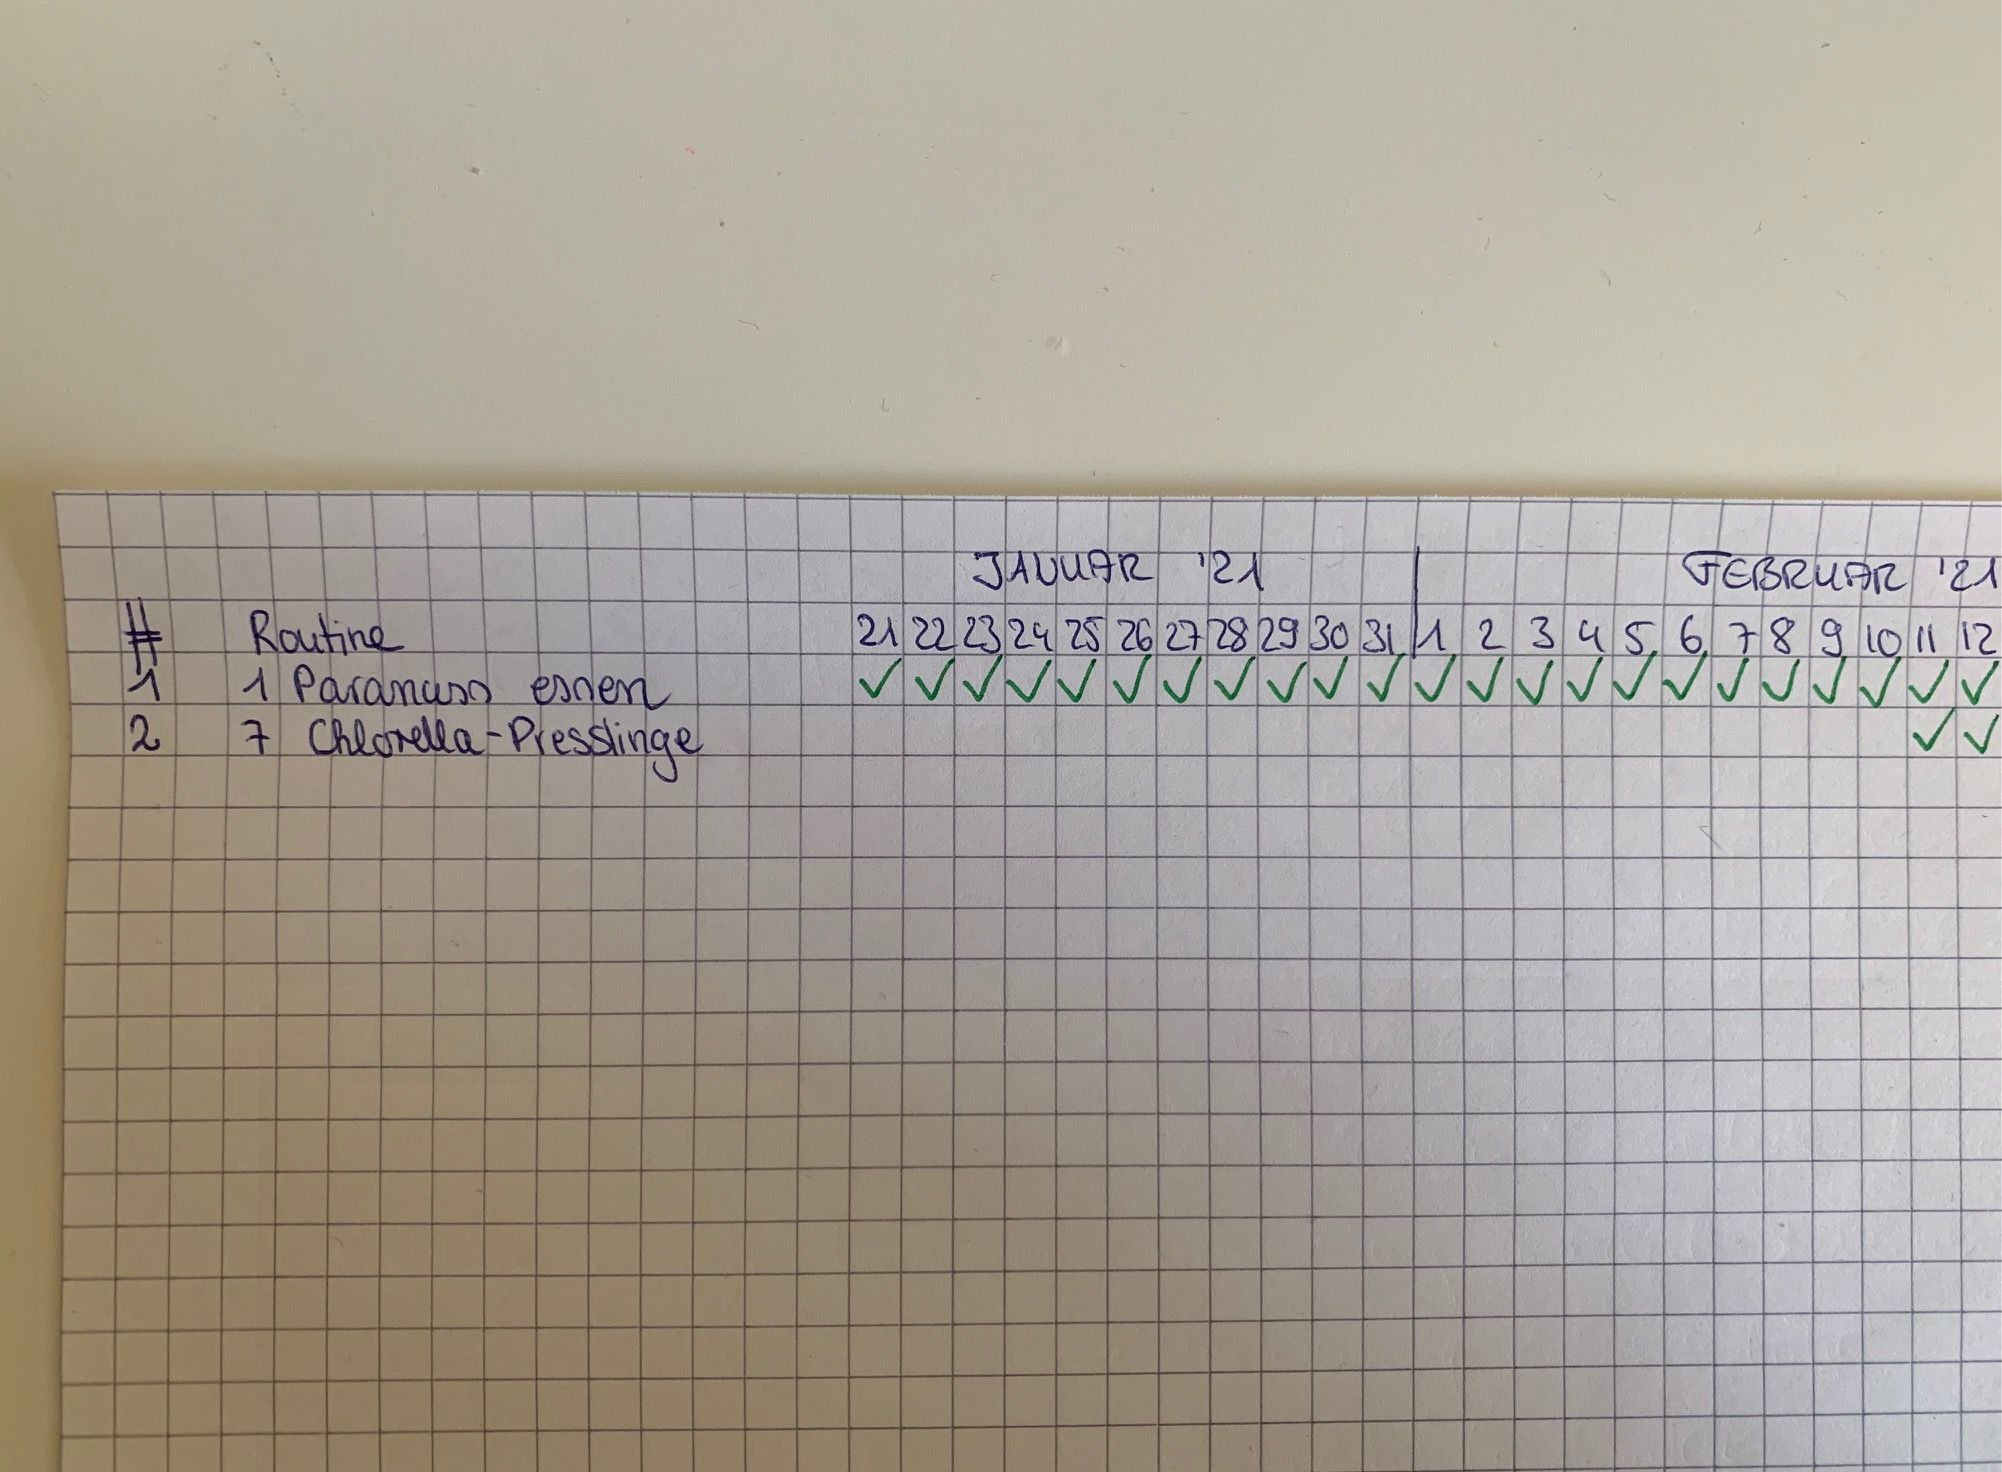 2. Routine: 7 Chlorella-Presslinge täglich